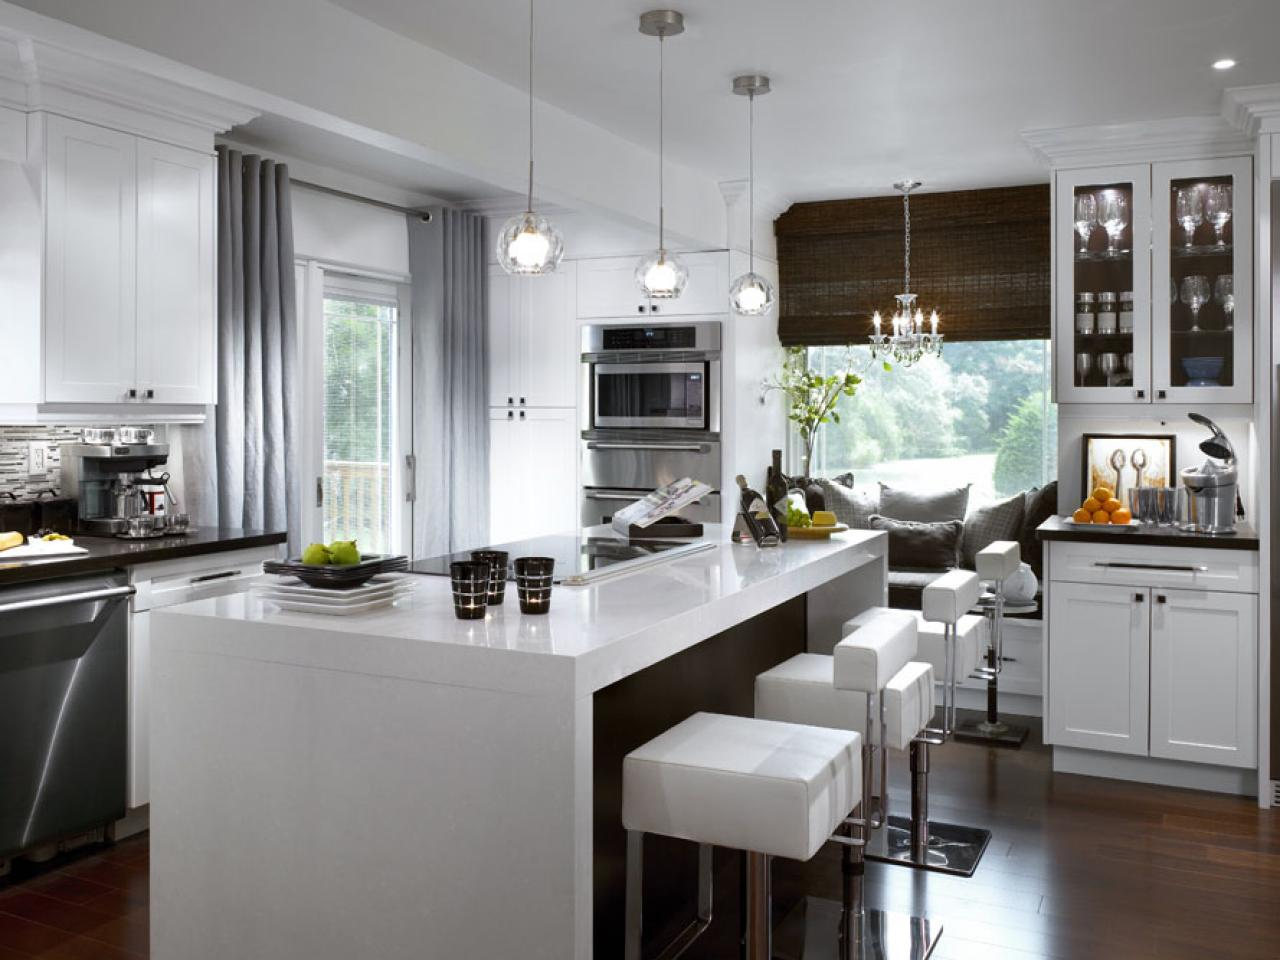 candice olson grey kitchen photo - 3